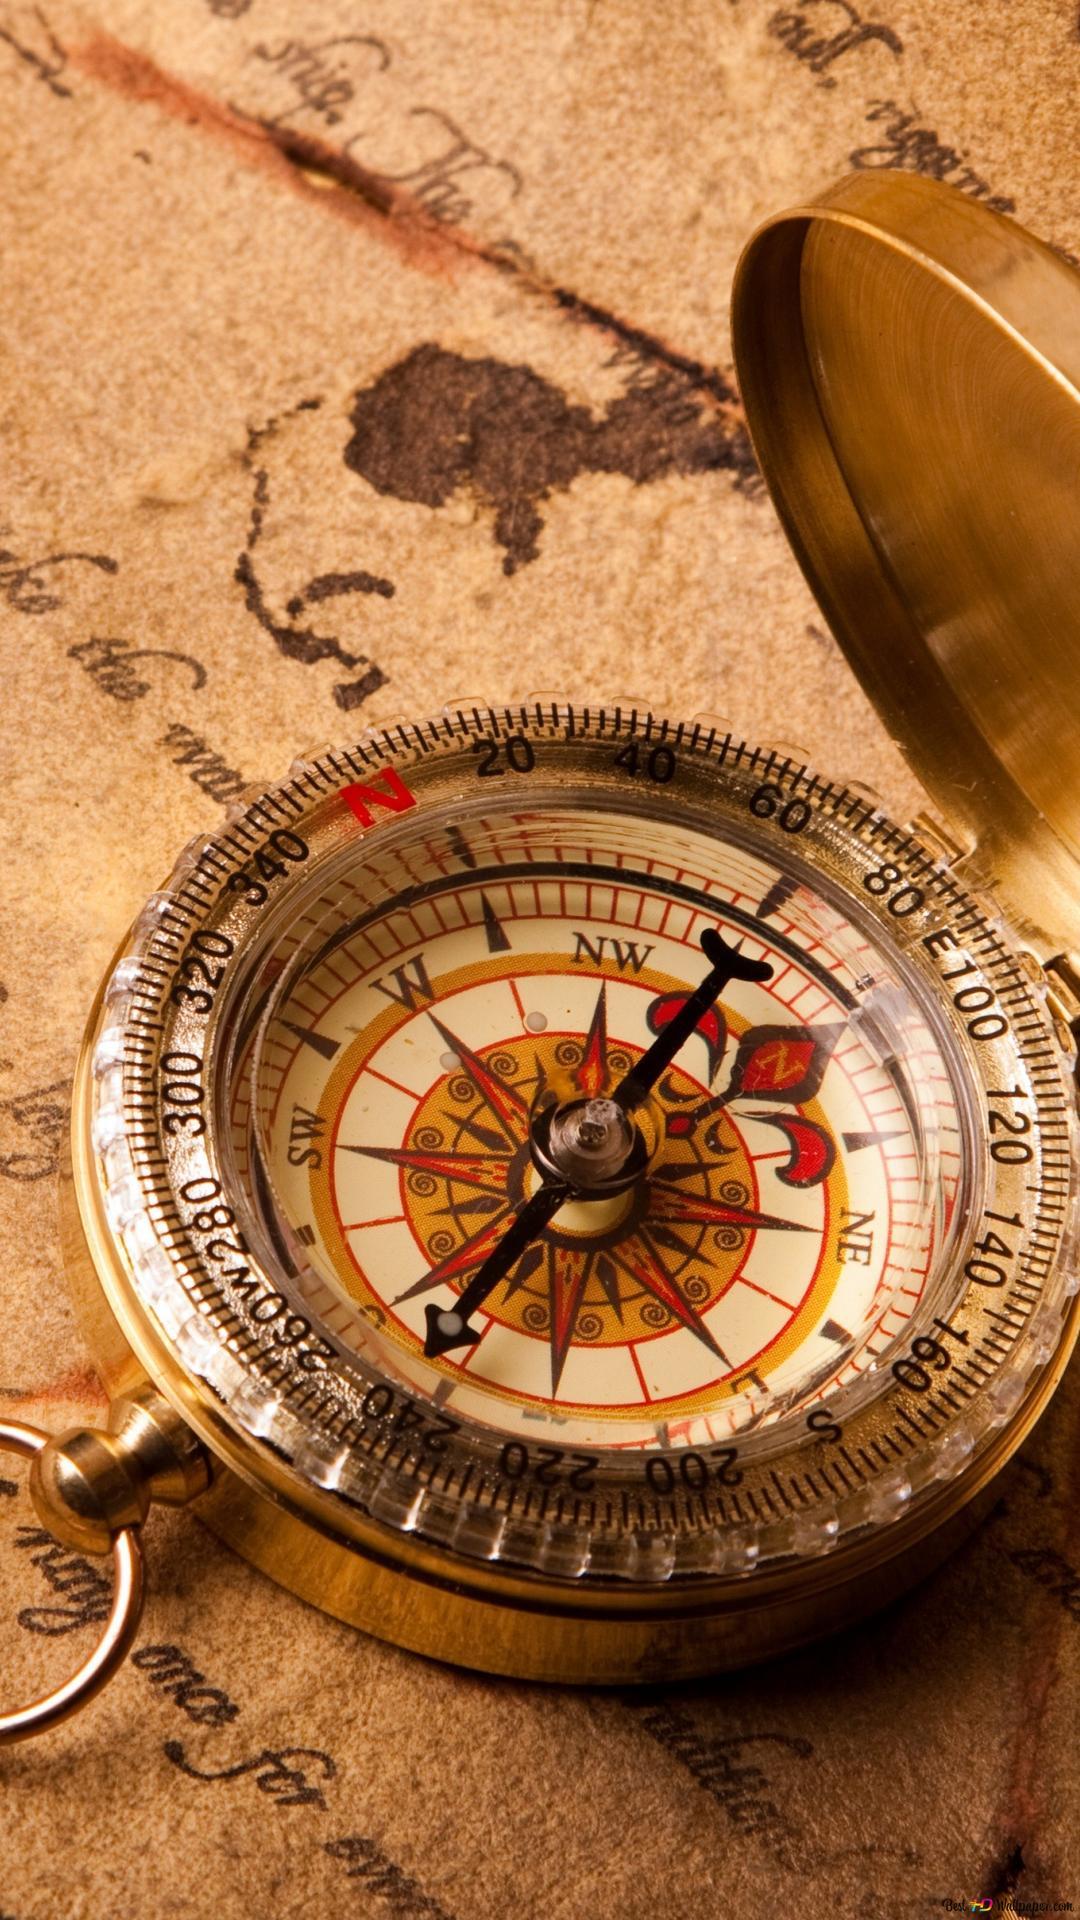 Vintage Compass Hd Wallpaper Download